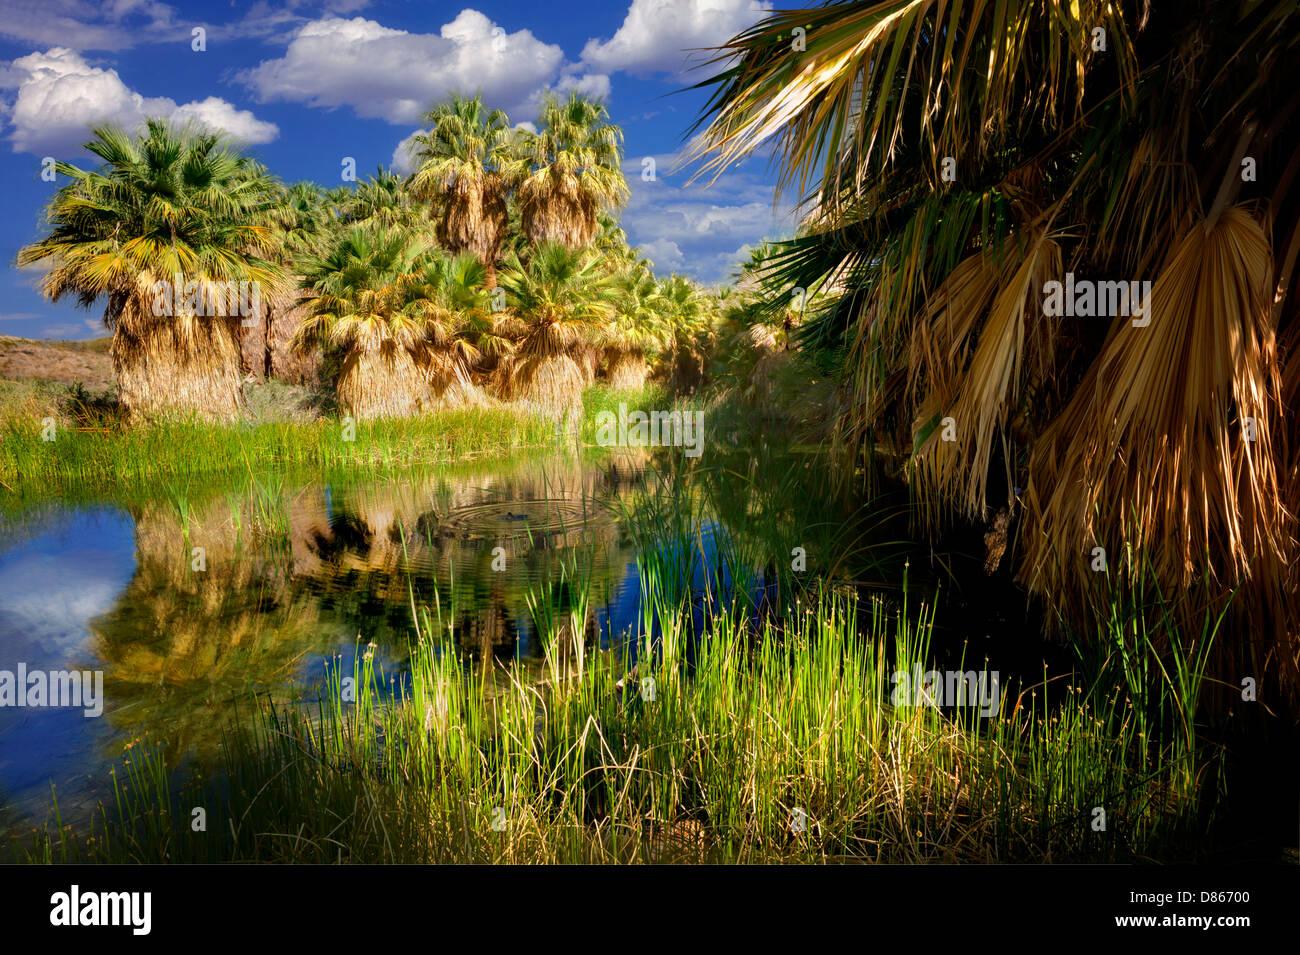 McCallum Teich. Coachella Valley zu bewahren. California Stockbild